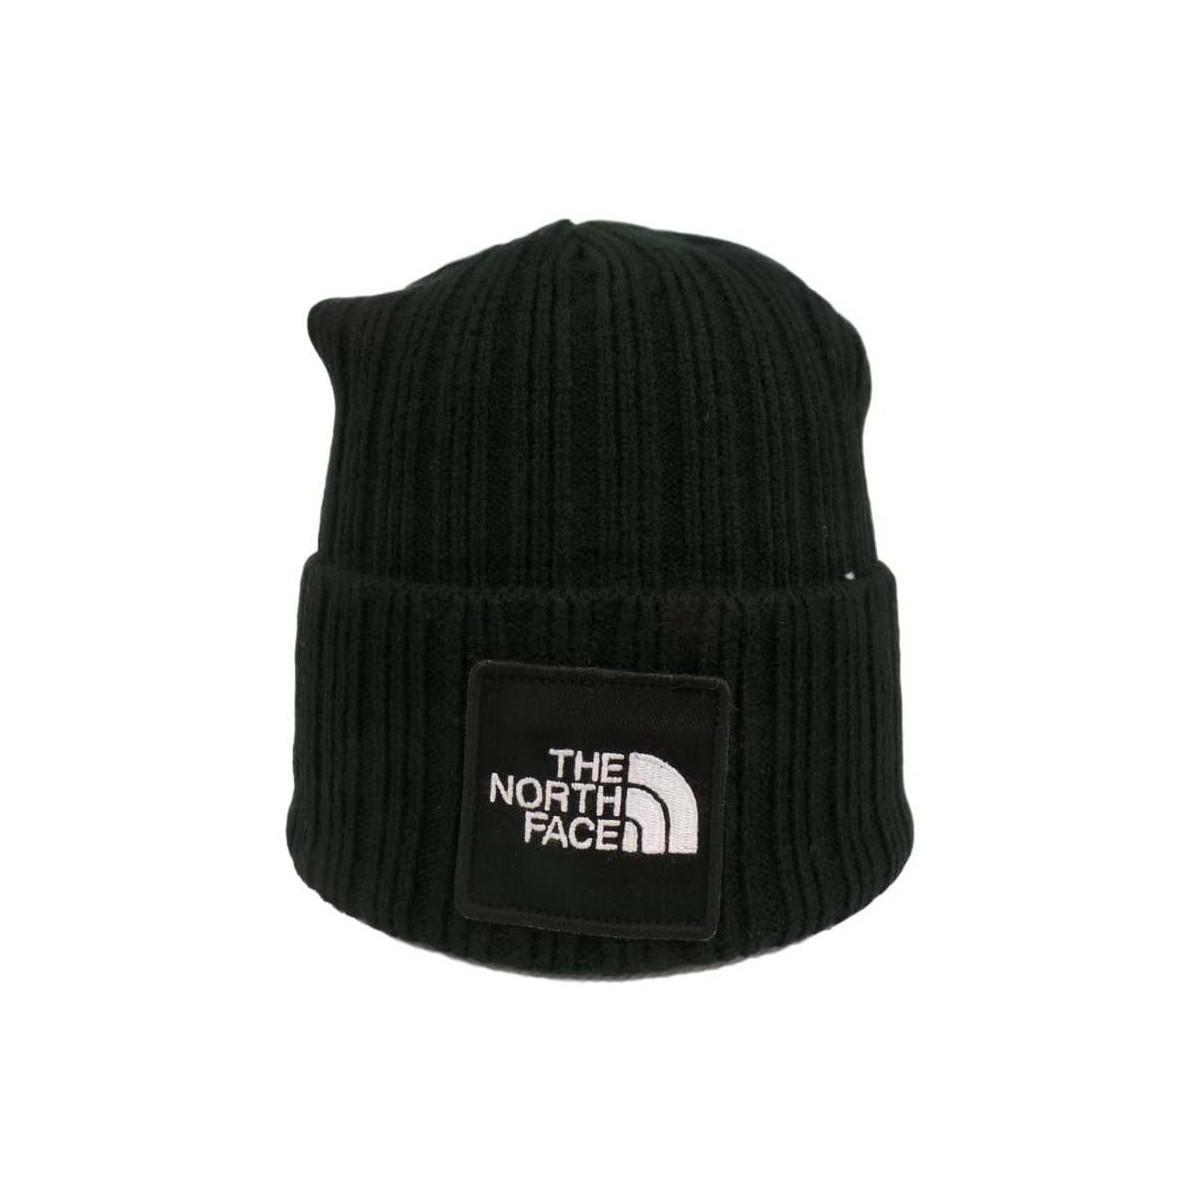 710c51eaf The North Face Tnf Logo Box Cuf Bne Men's Beanie In Black for Men - Lyst